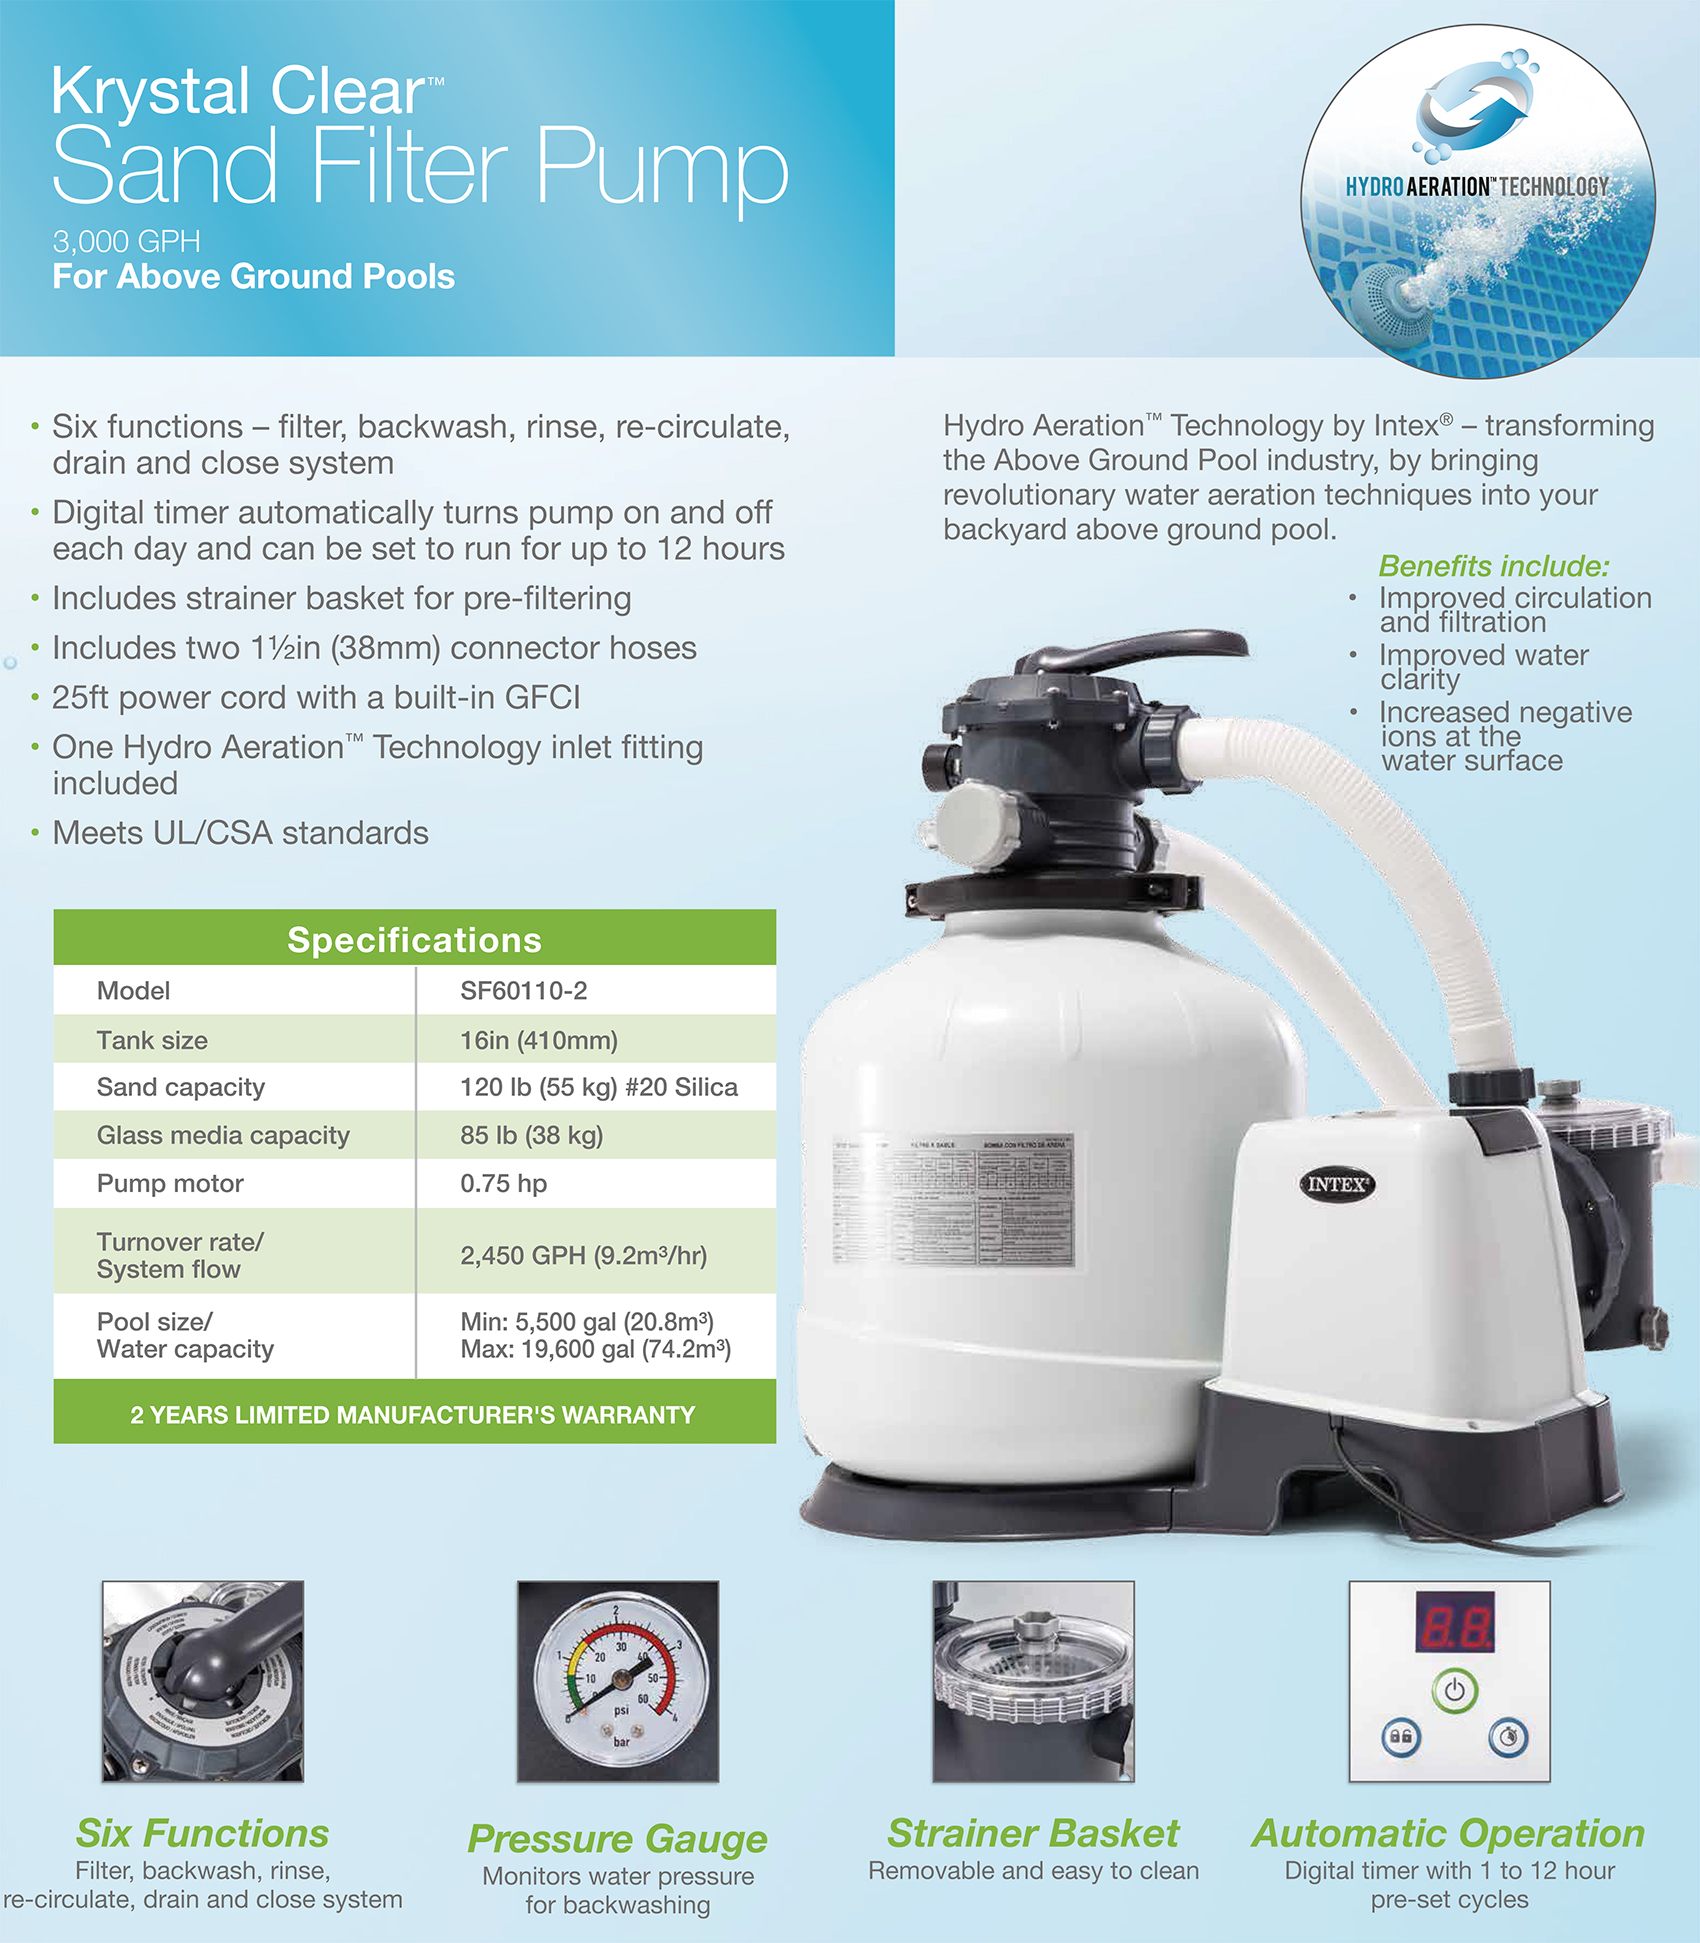 3000 Gph Krystal Clear Sand Filter Pump, 110-120V with GFCI